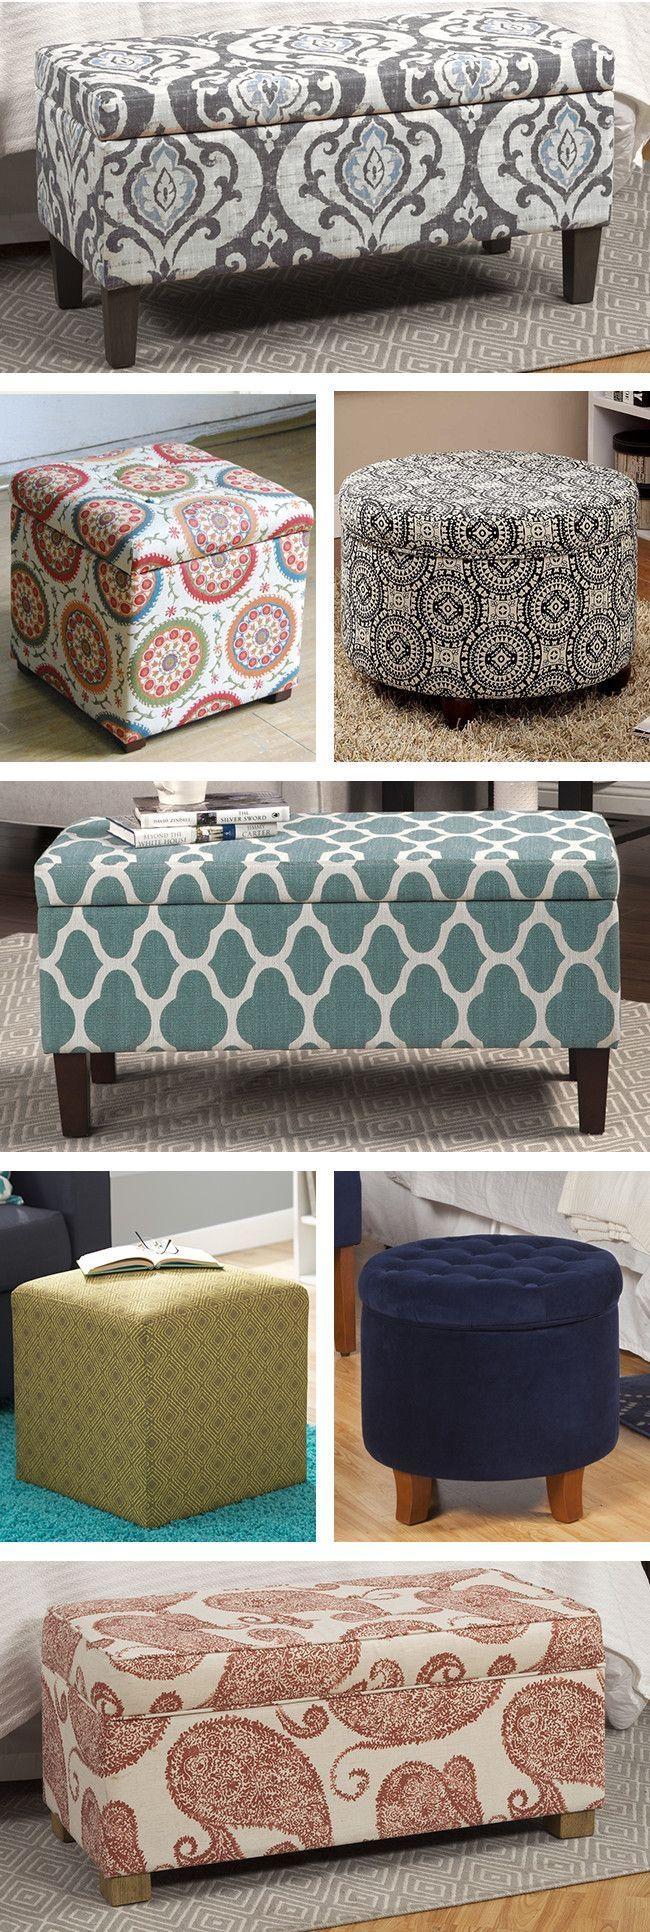 279 Best Ottoman – Pouf – Foot Stool + Images On Pinterest Regarding Footstool Pouffe Sofa Folding Bed (Image 1 of 20)